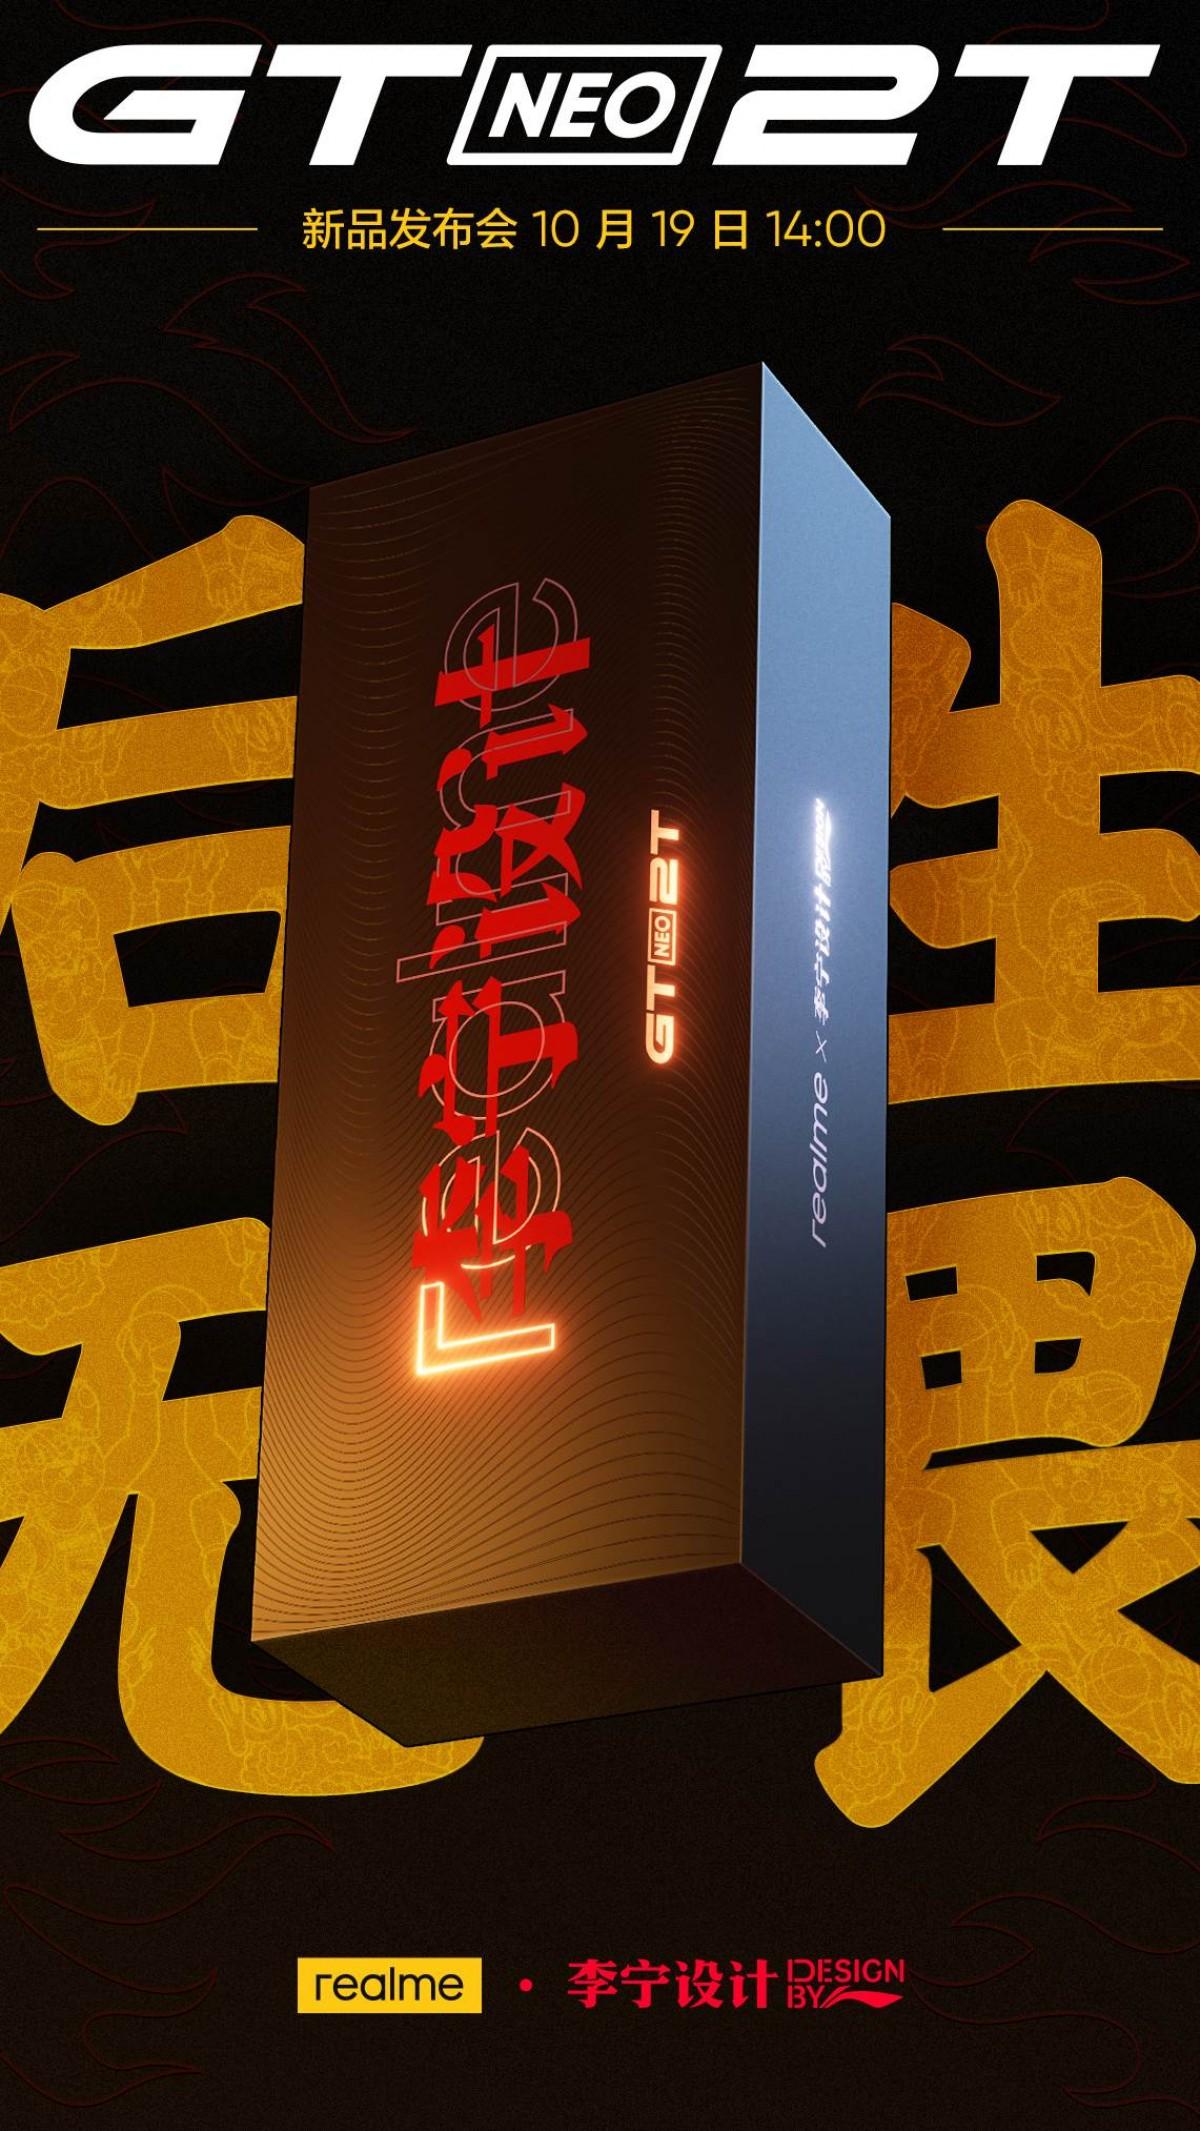 Realme GT Neo2T की पुष्टि, 19 अक्टूबर को आएगा